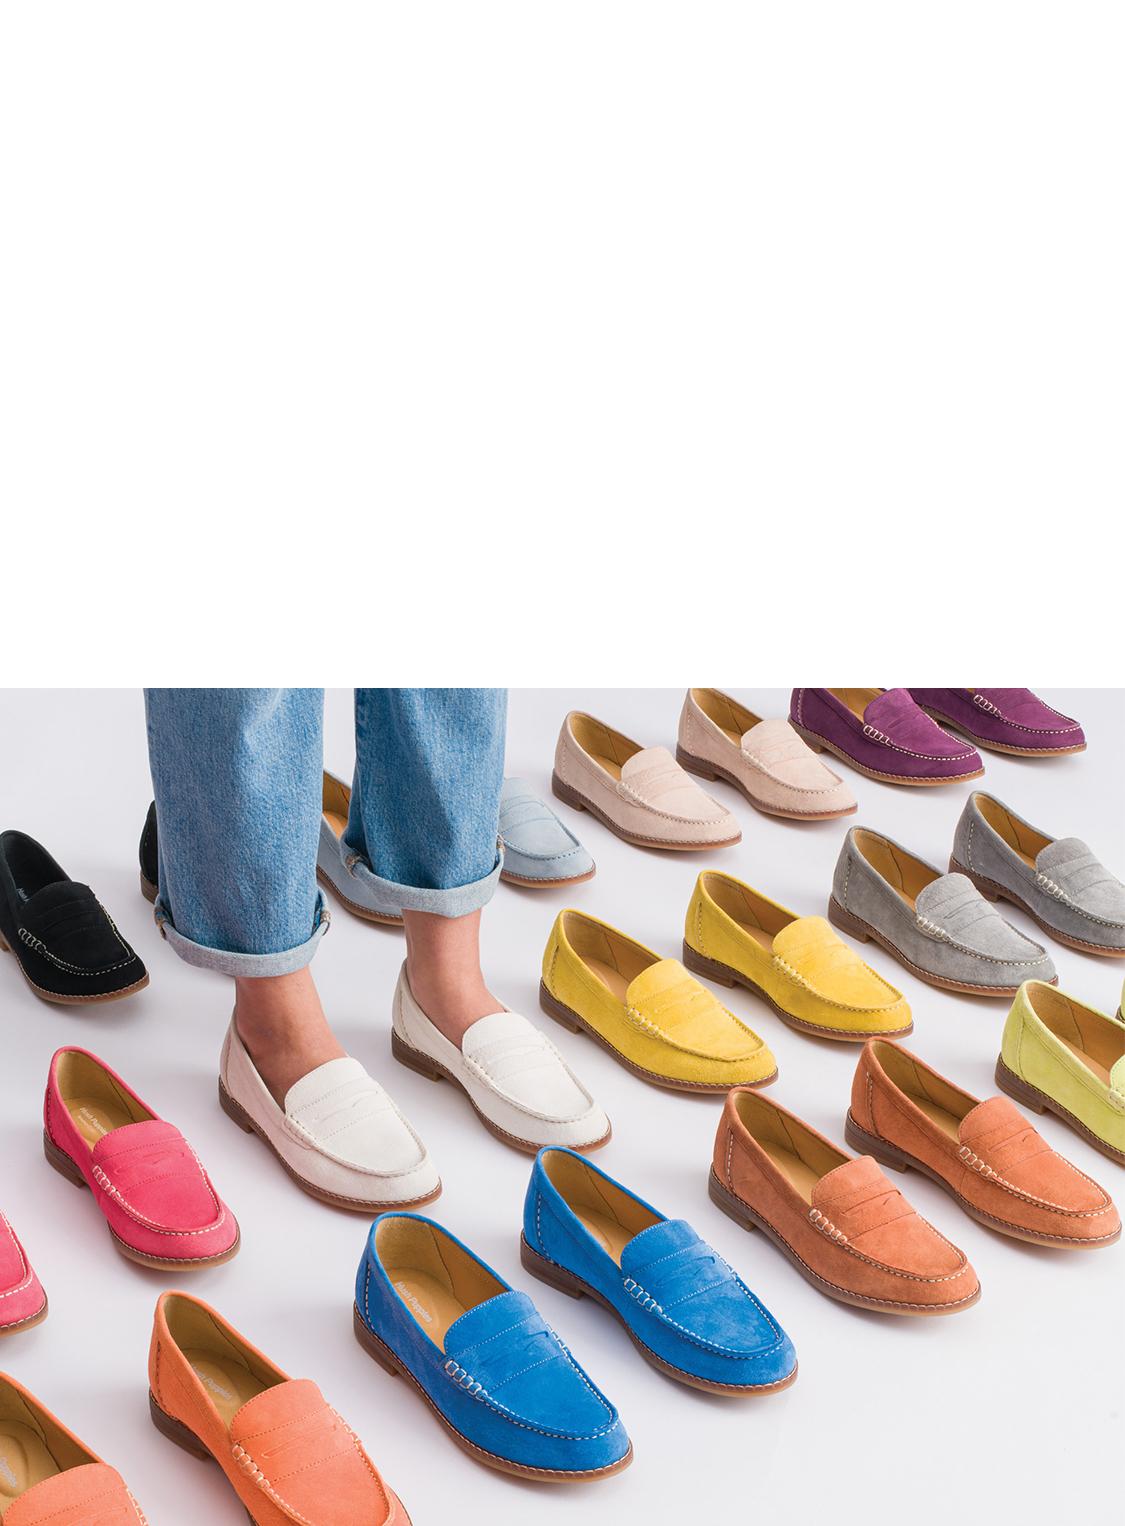 Wren loafer shoes